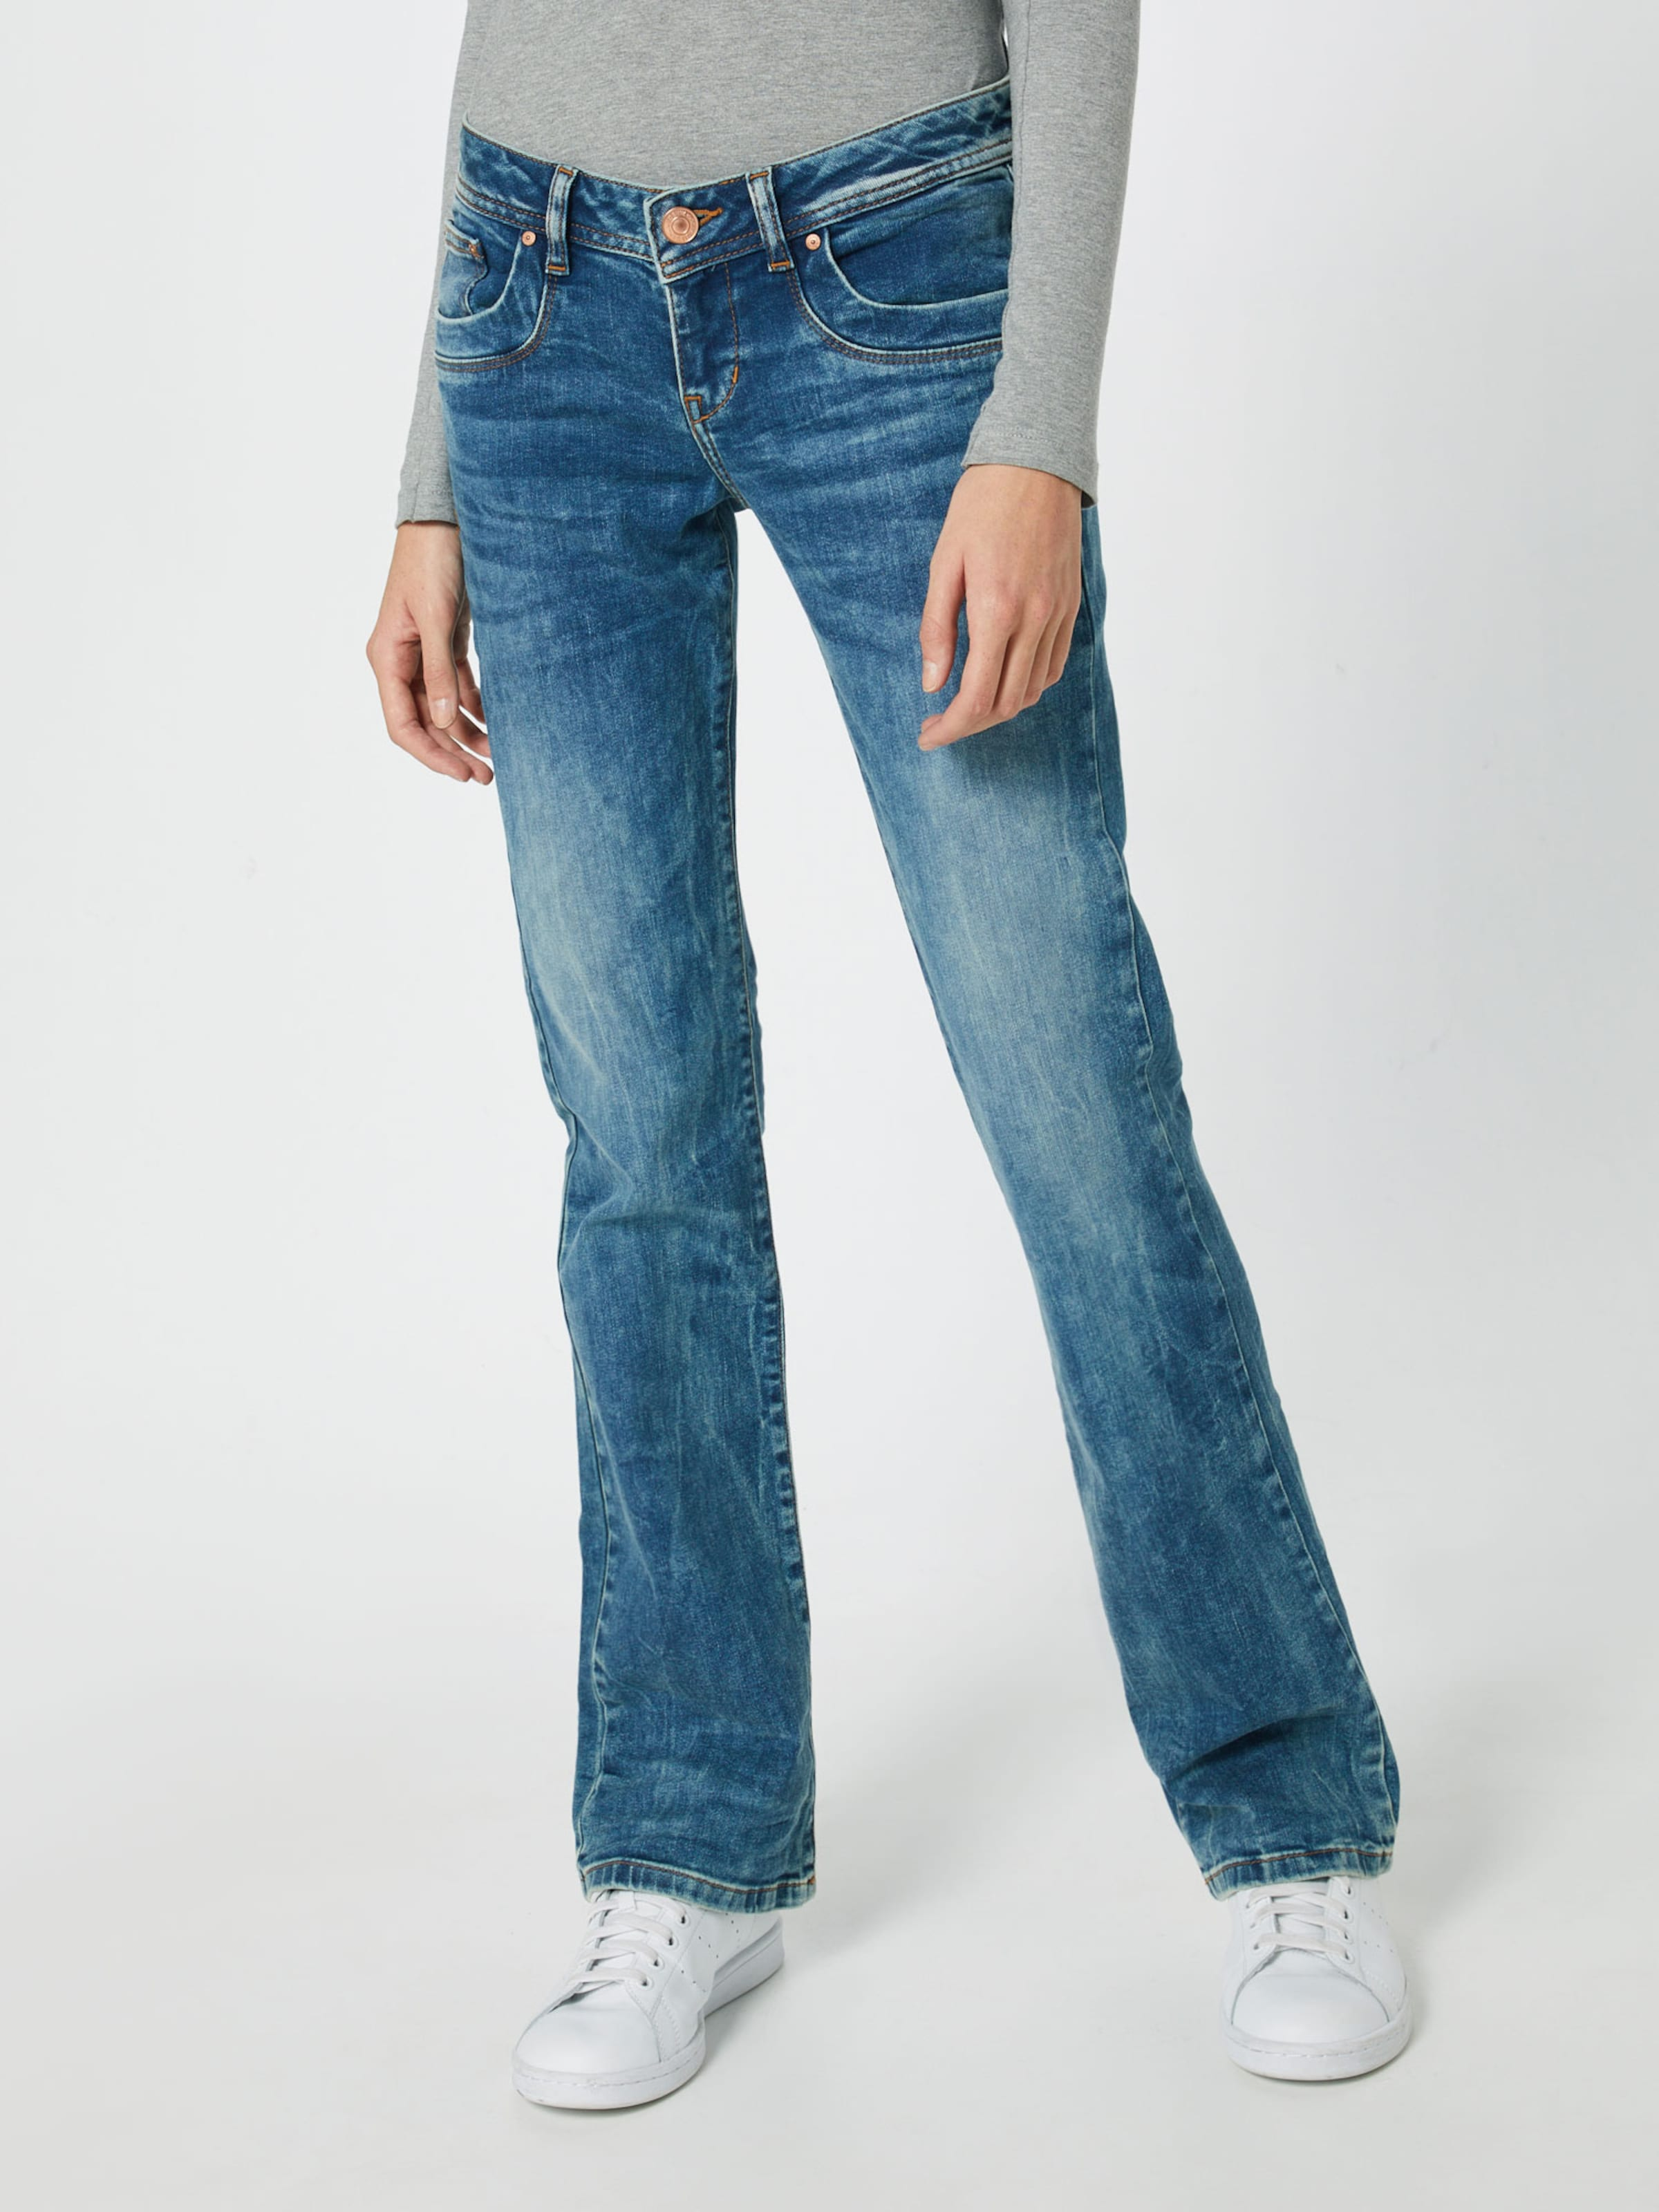 Denim Ltb 'valerie' In Blue Jeans m80wNn